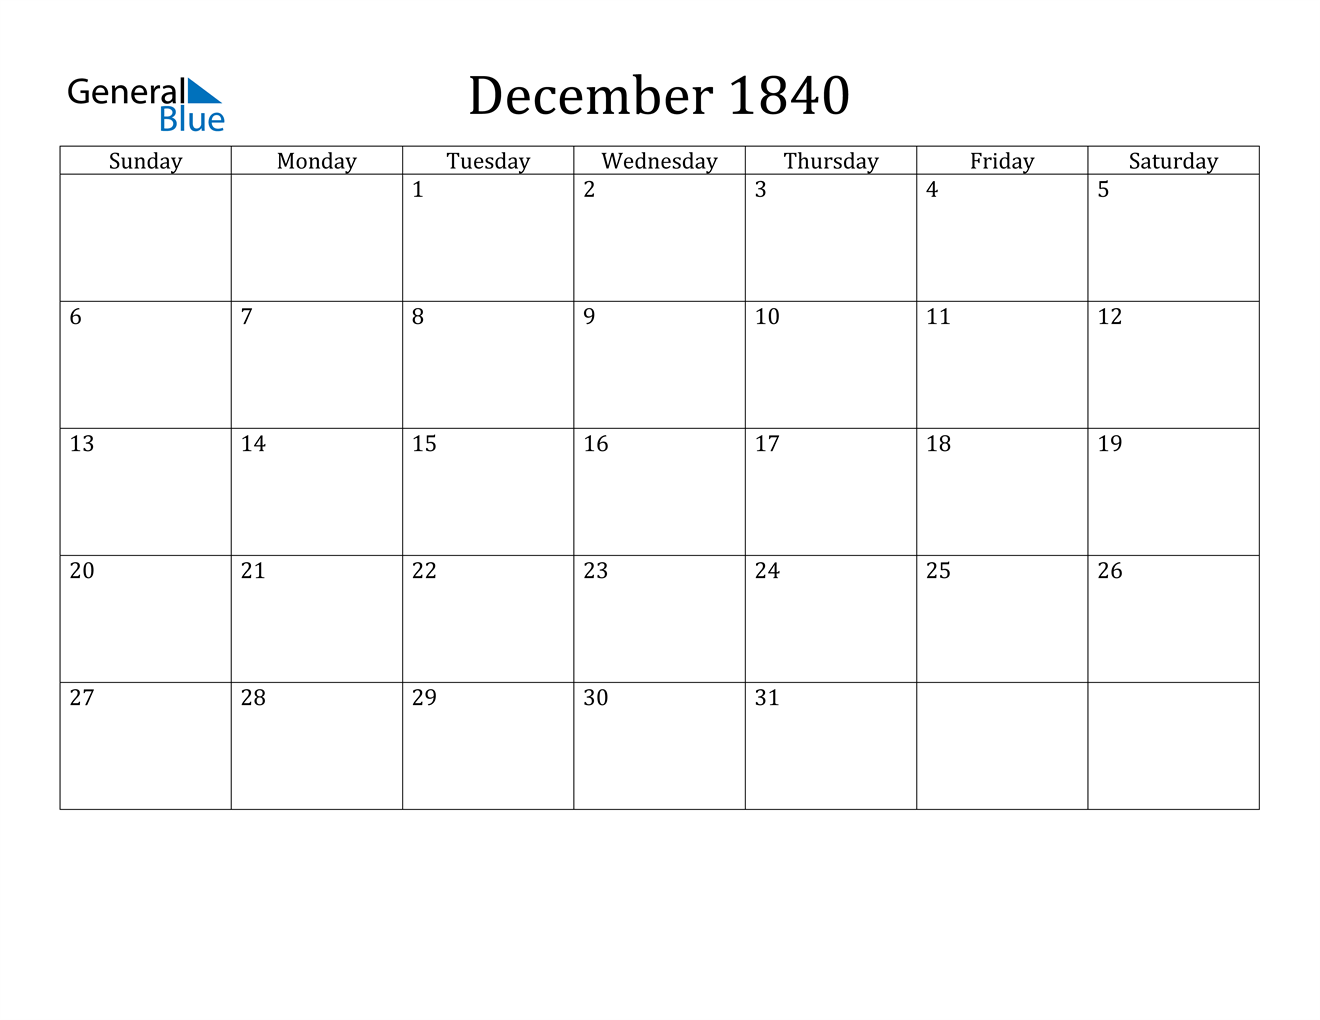 Image of December 1840 Calendar